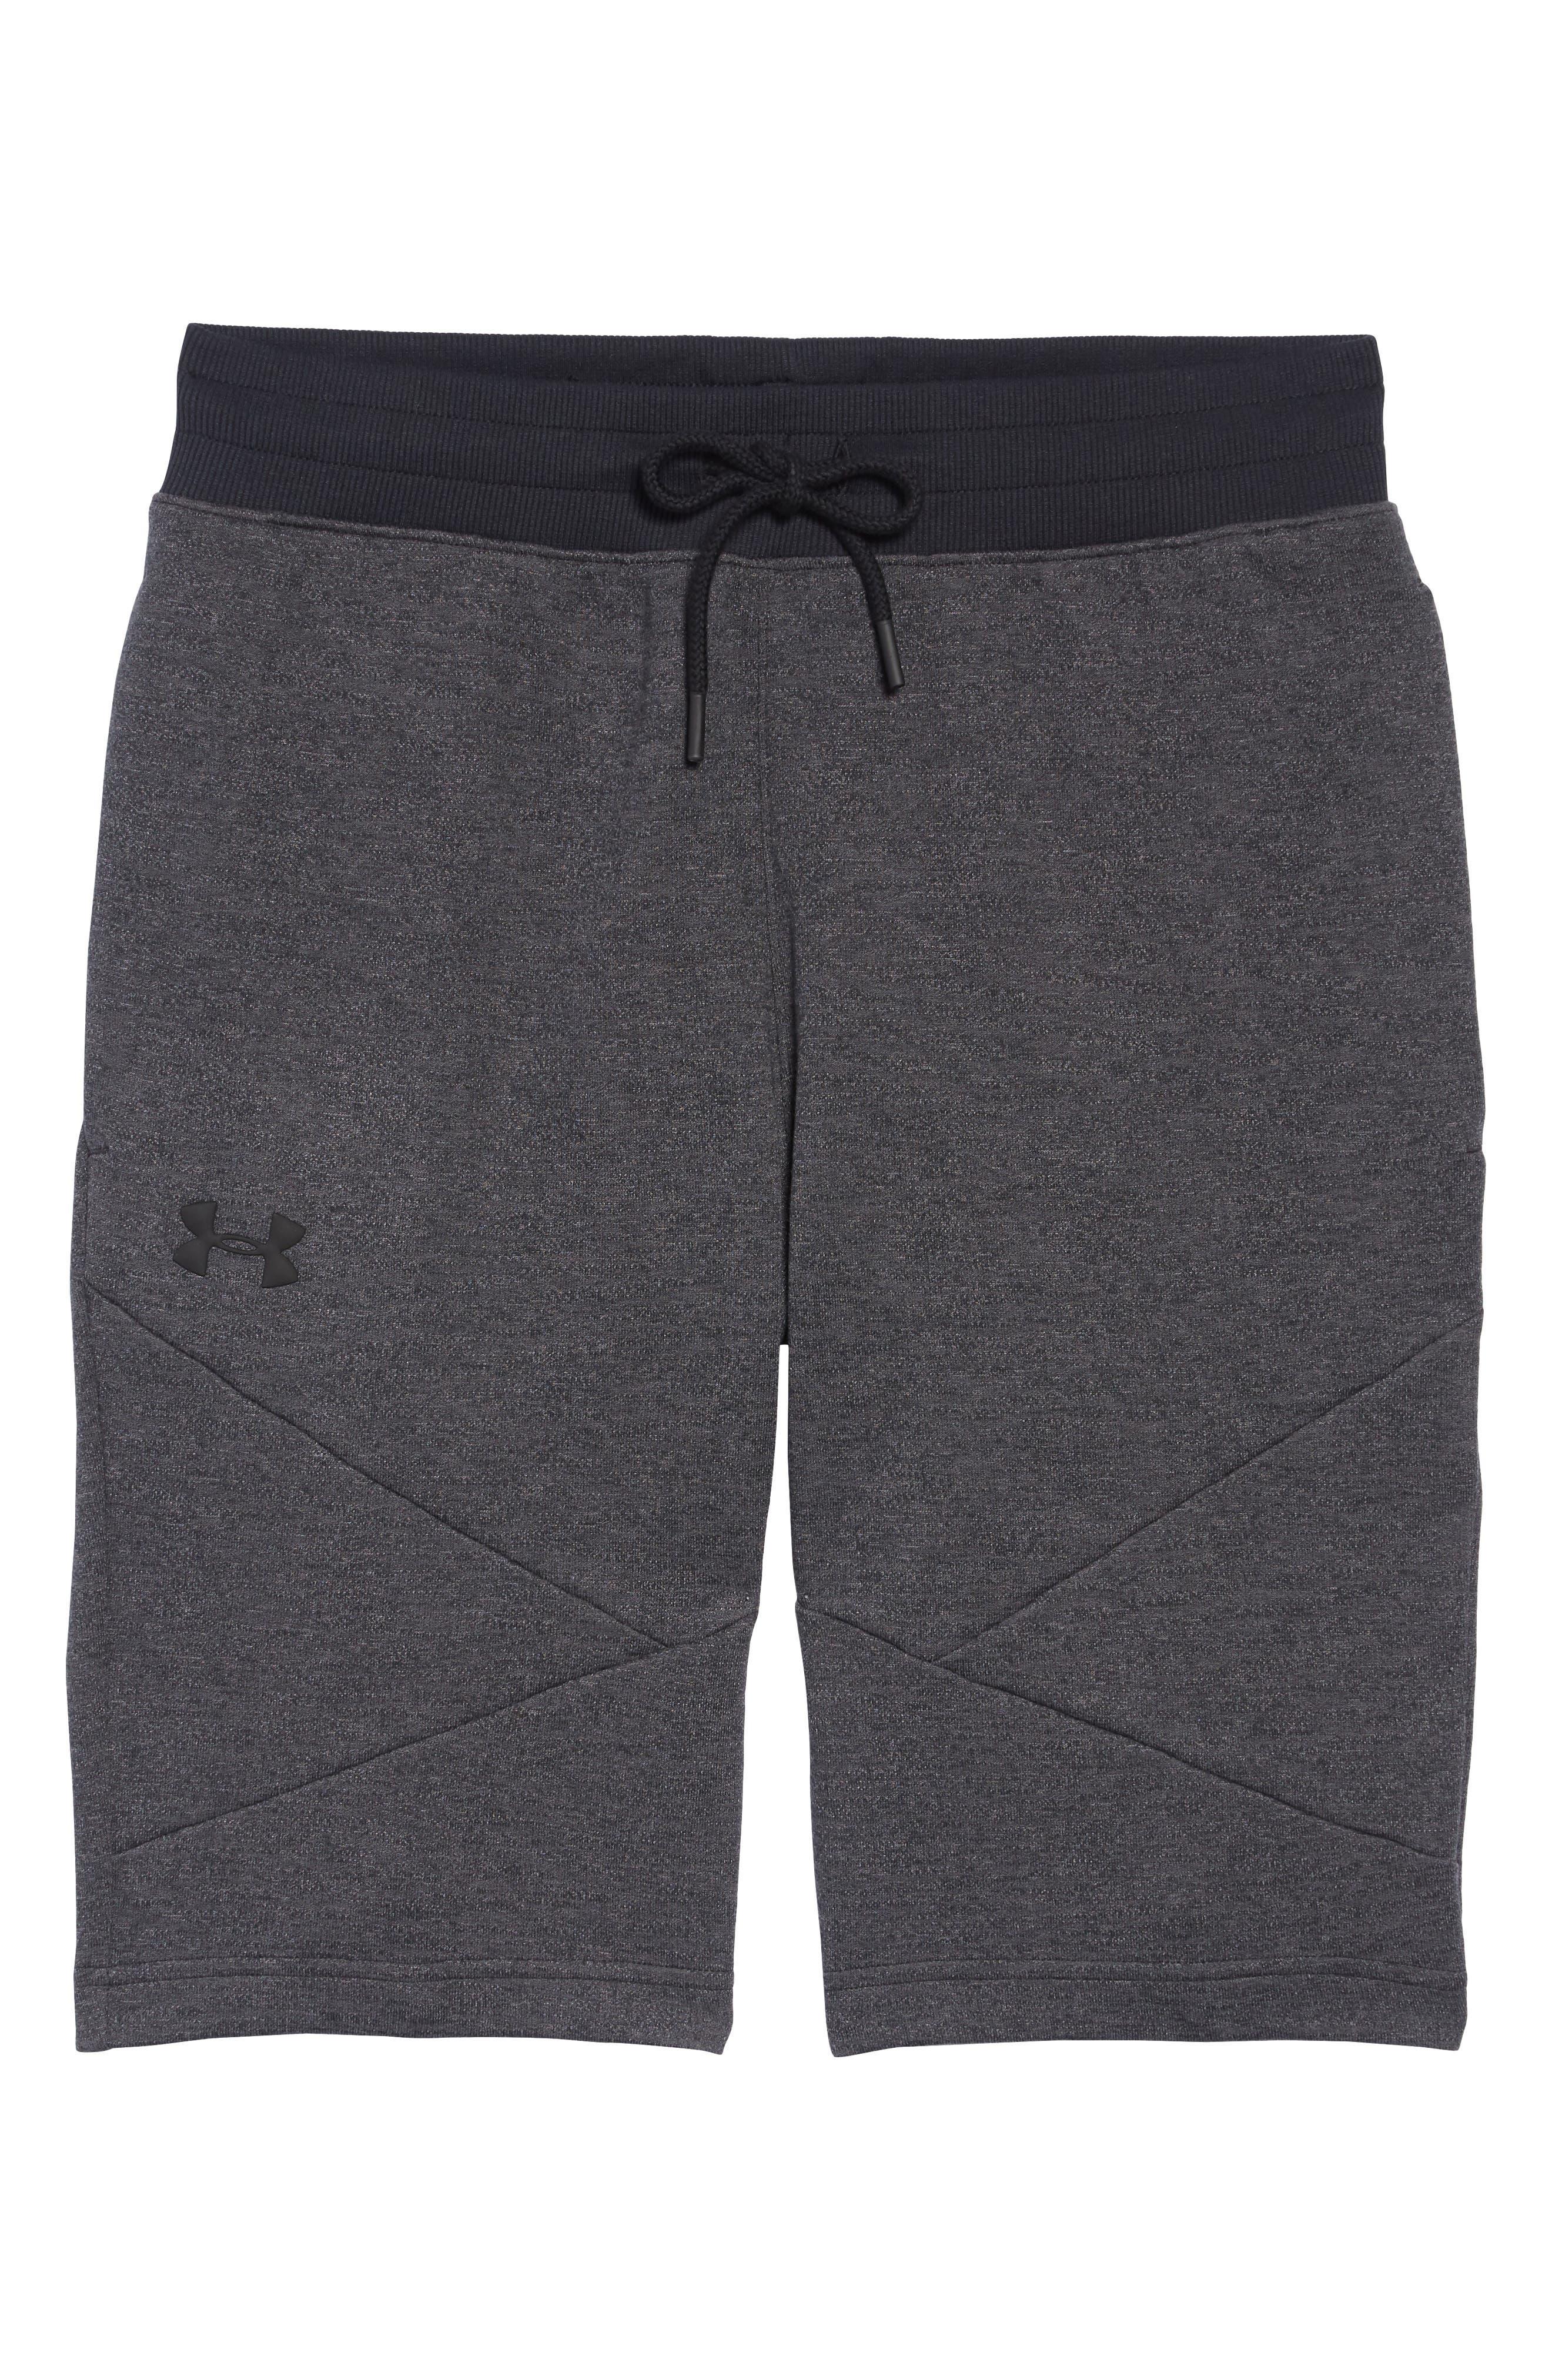 Sportstyle 2X Regular Fit Shorts,                             Alternate thumbnail 6, color,                             BLACK